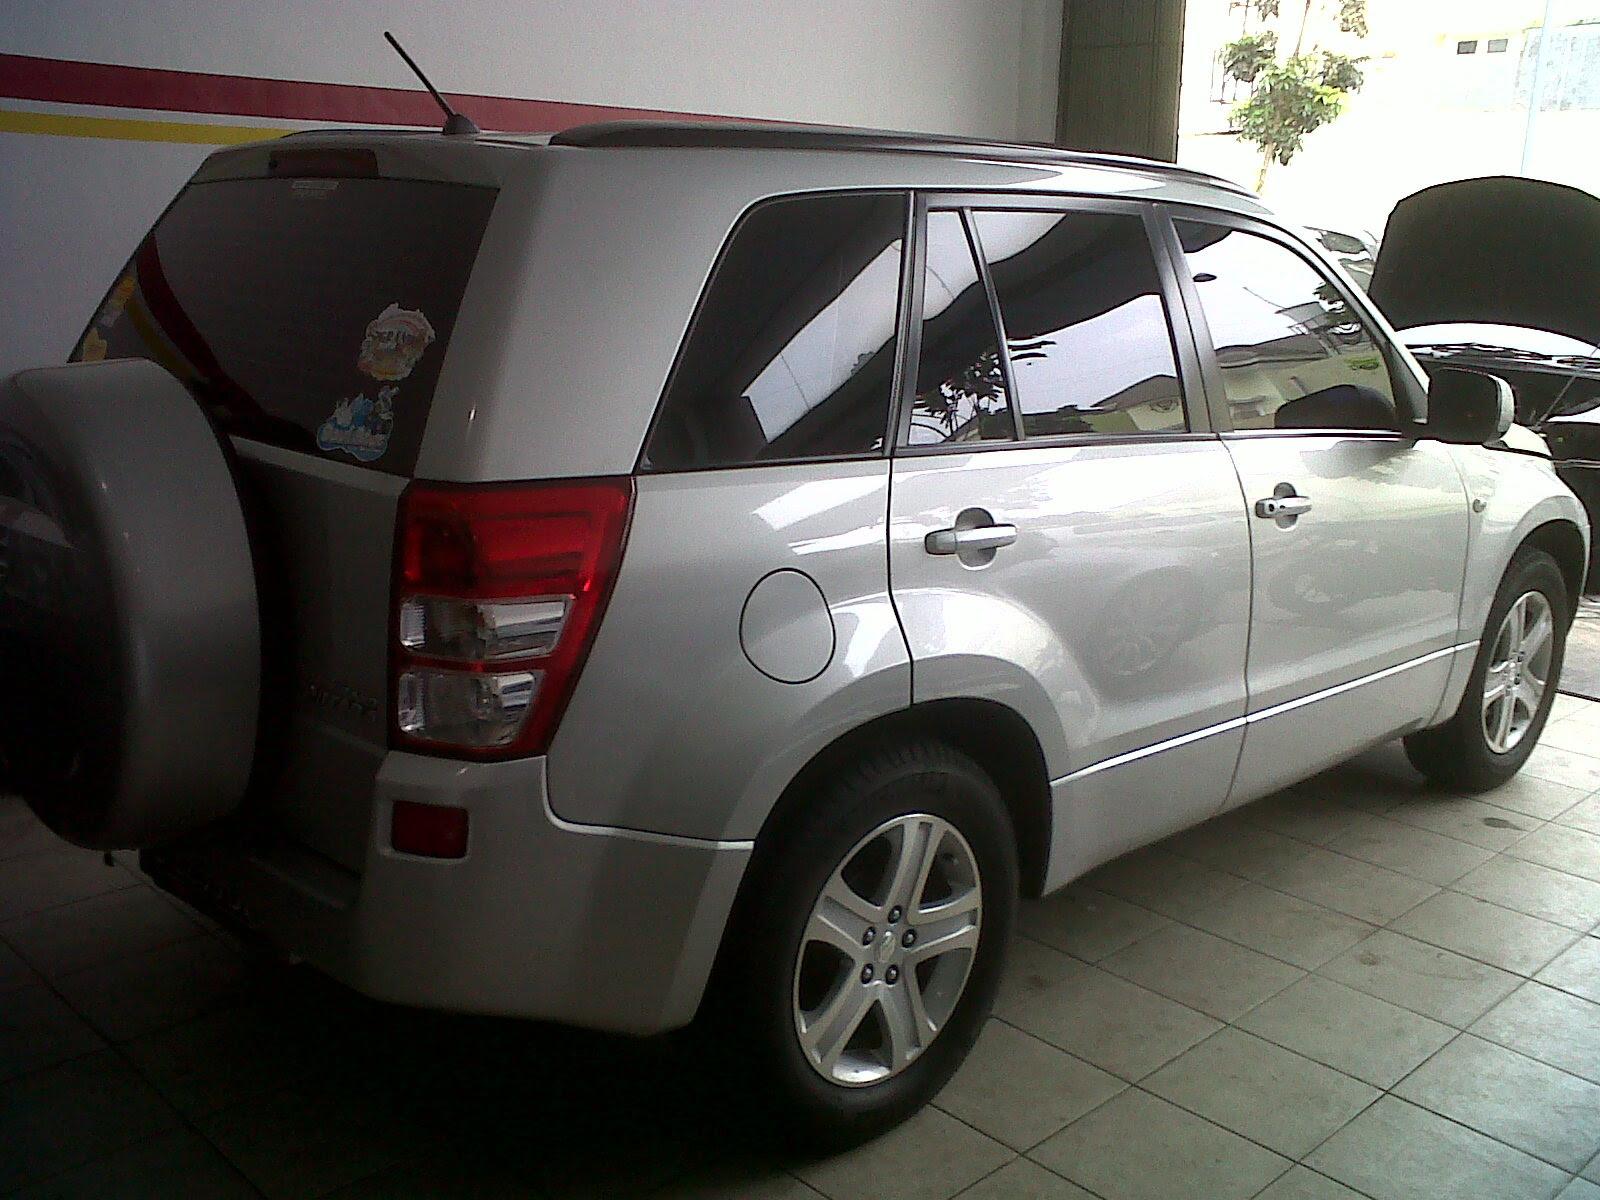 Mobil Bekas Toyota Kijang Lsx Harga Jual Mobil Bekas ...